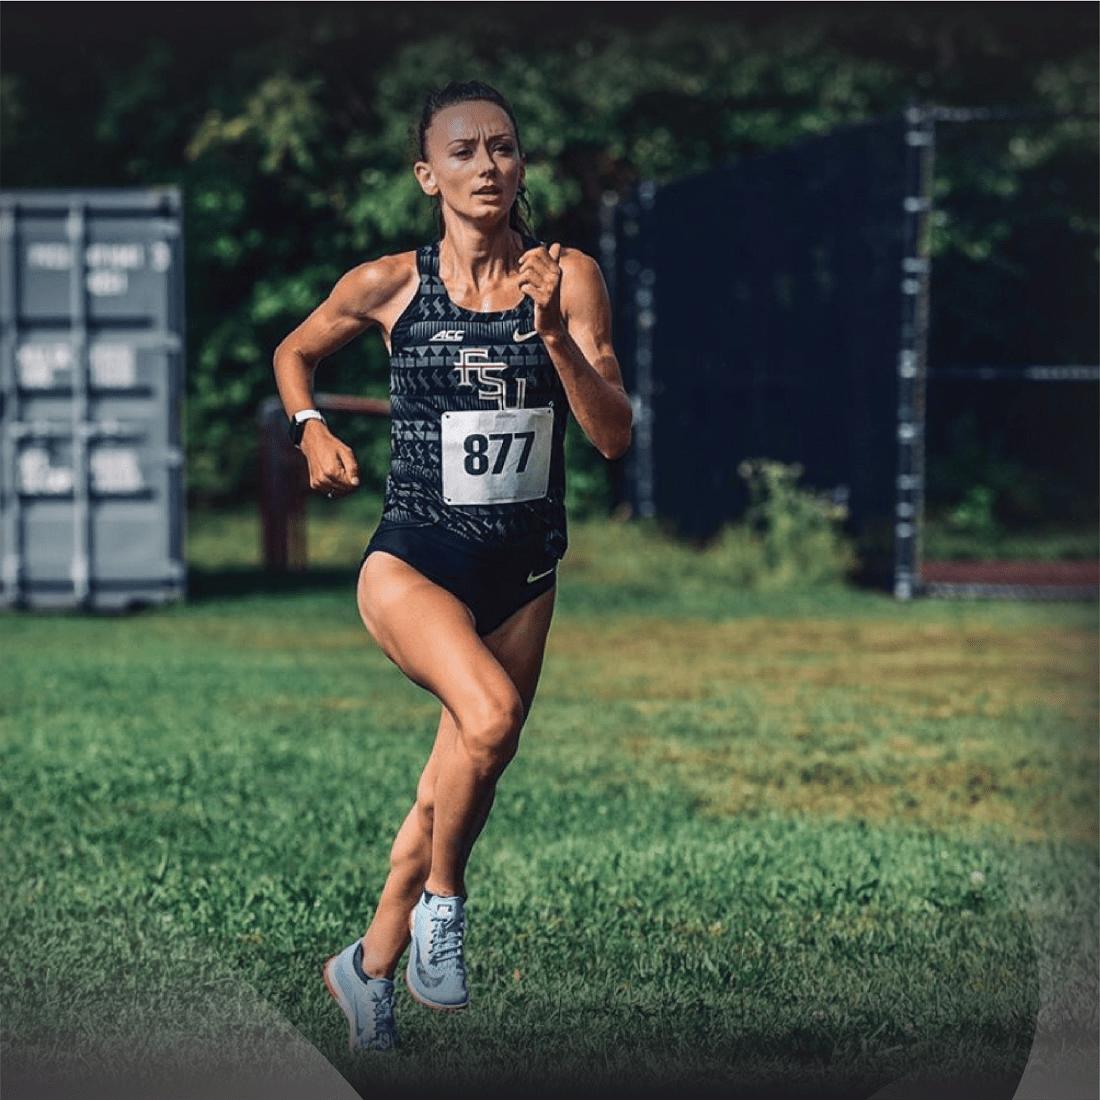 image 1100 x 1100 pixels of woman runner - Militsa